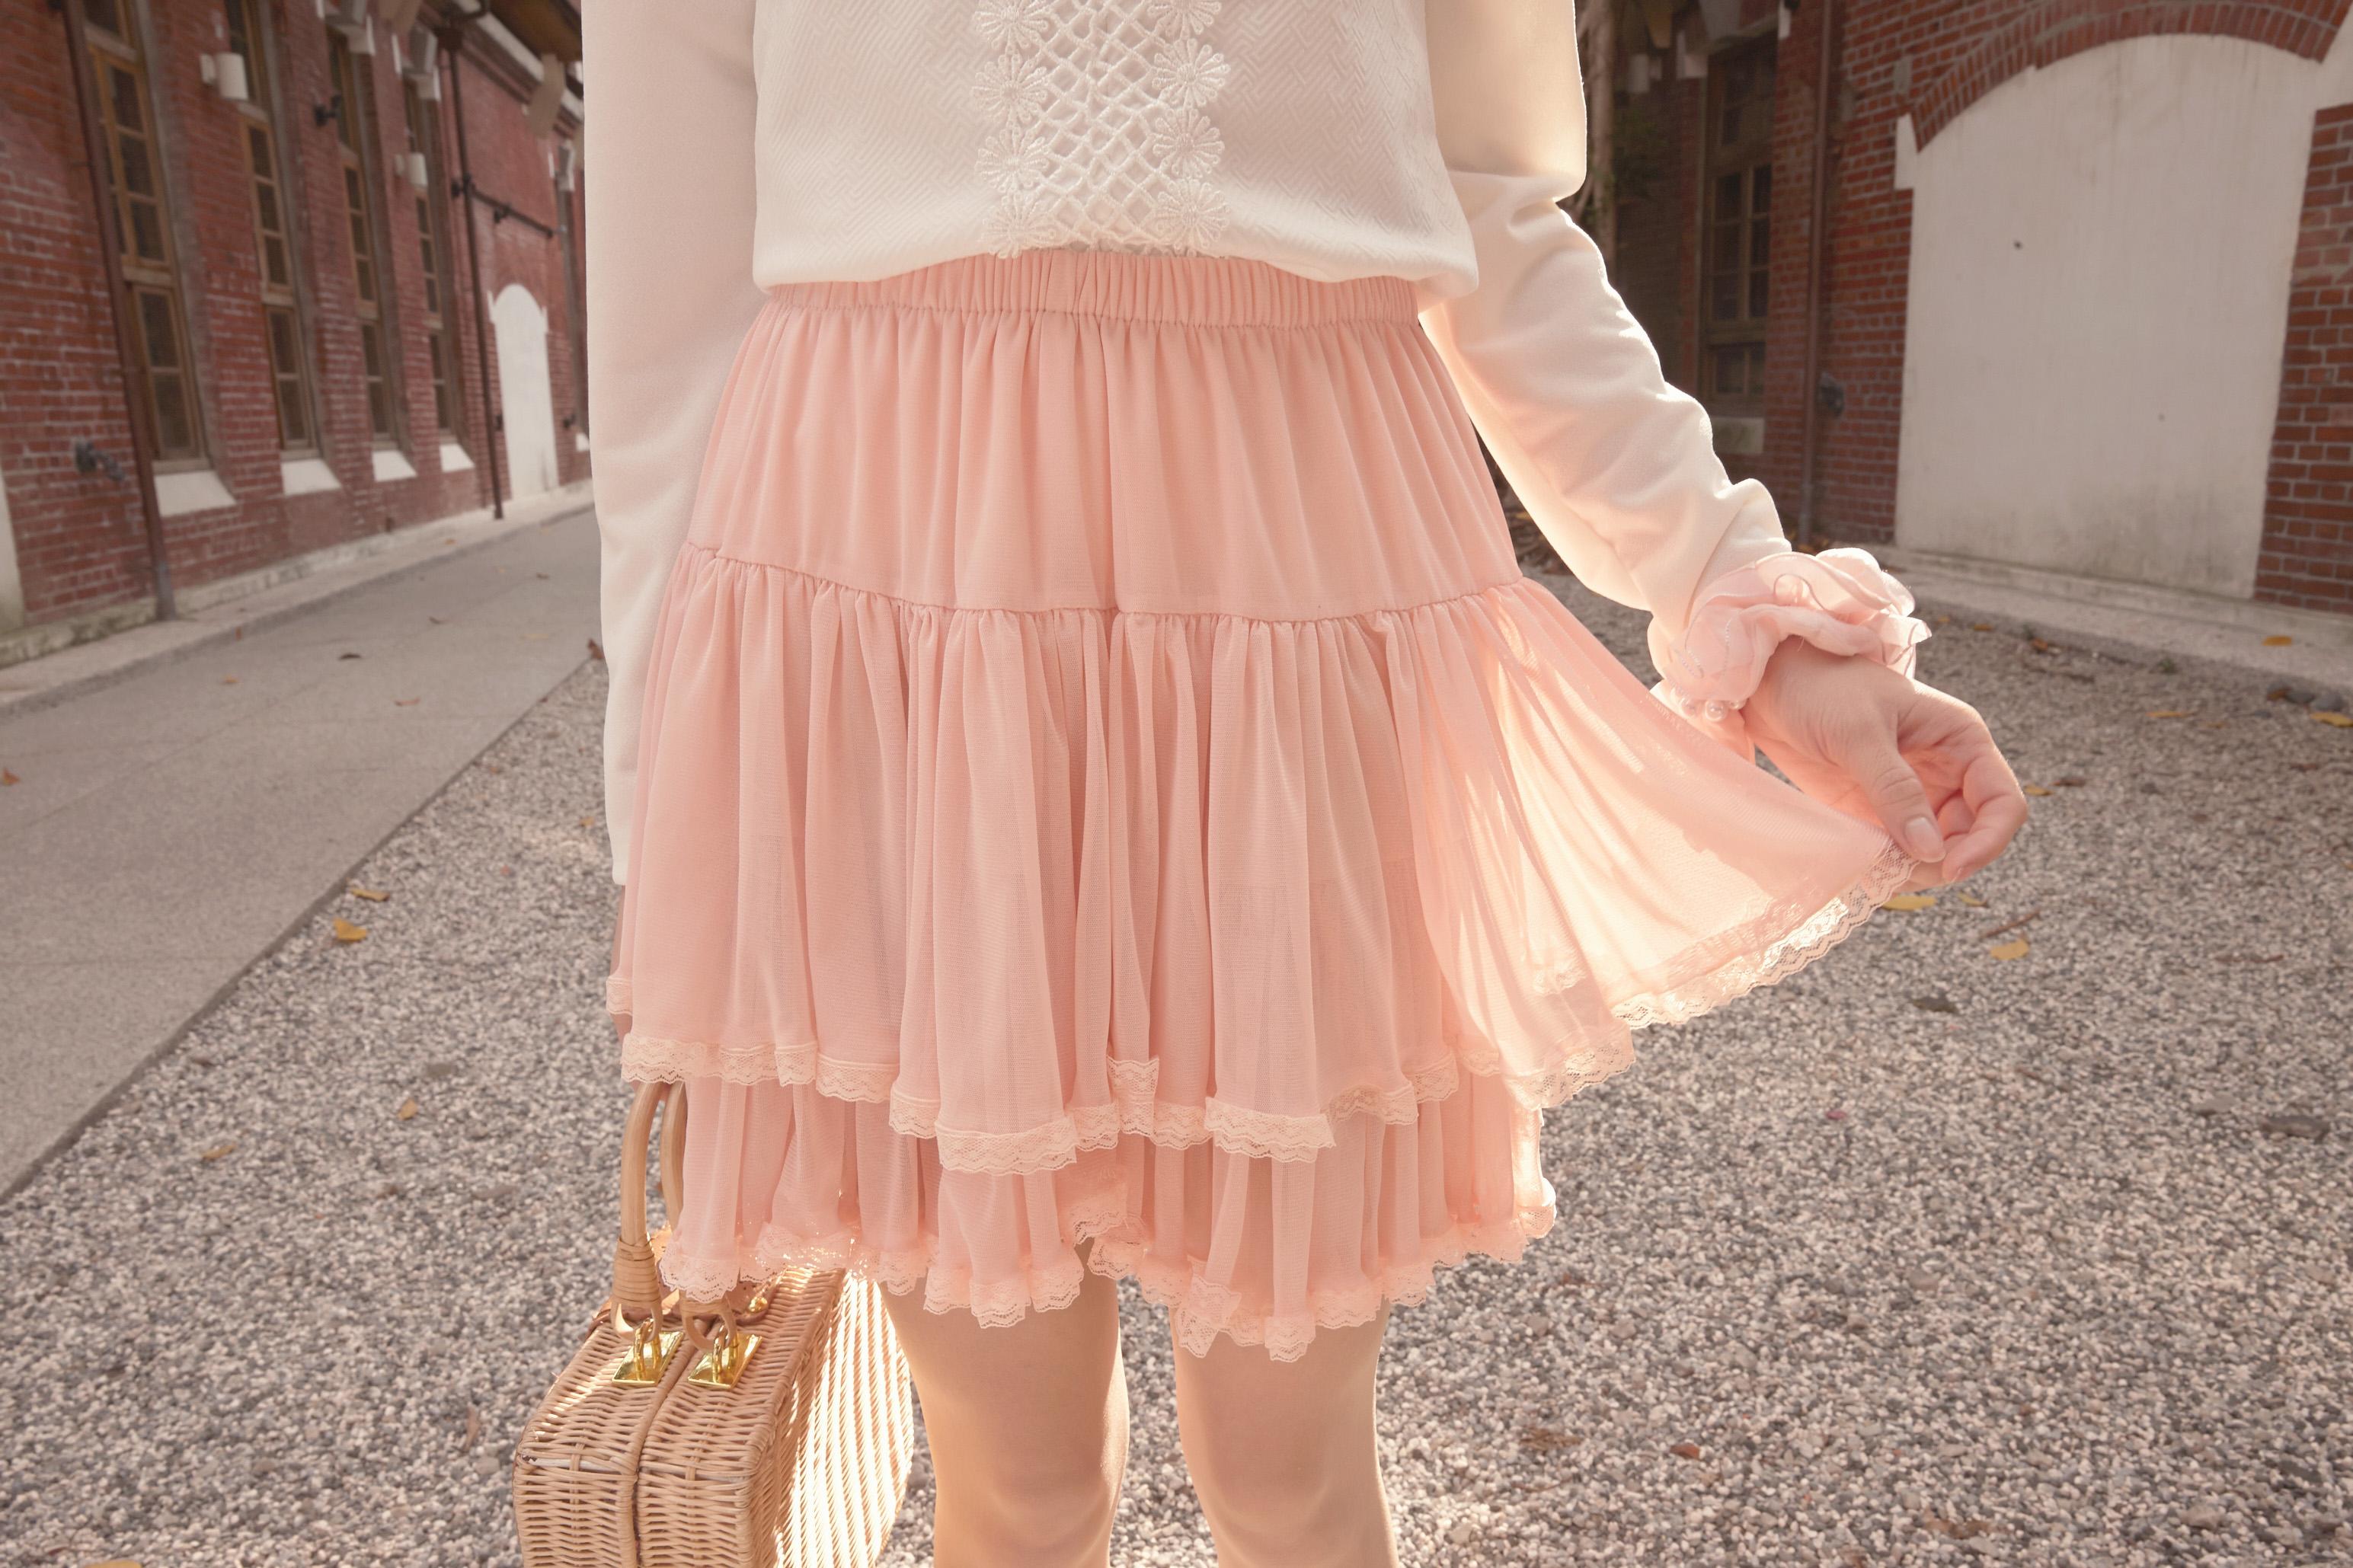 YOCO Womens Layered Chiffon Skirt With Lace Trim Japanese/Korean Fashion